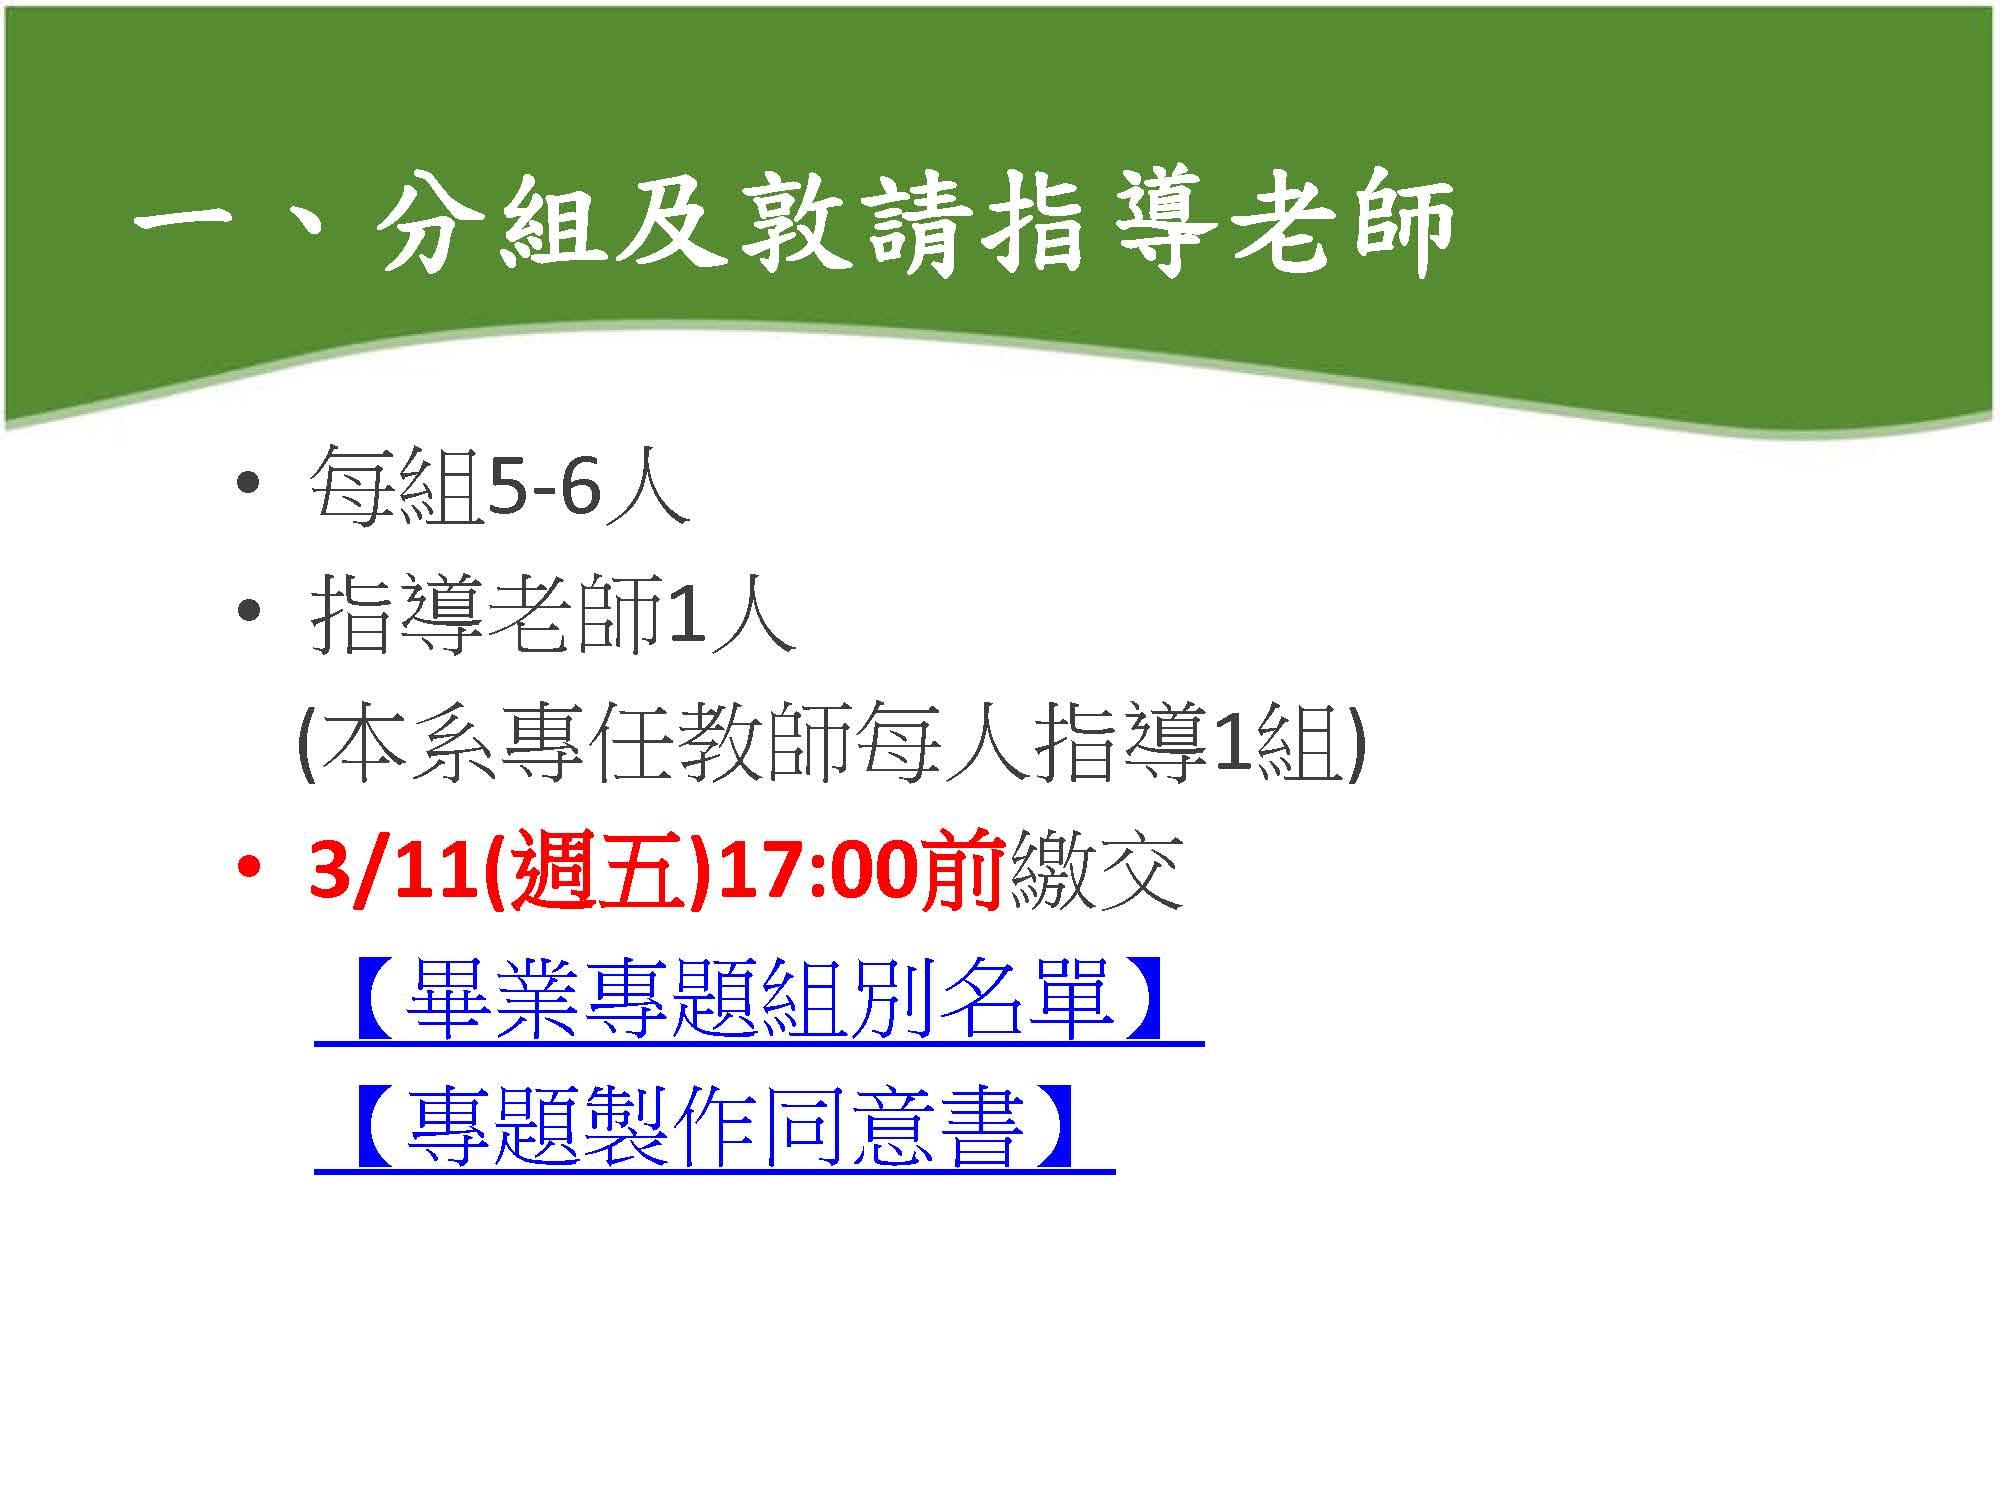 20160224110054_link_頁面_08